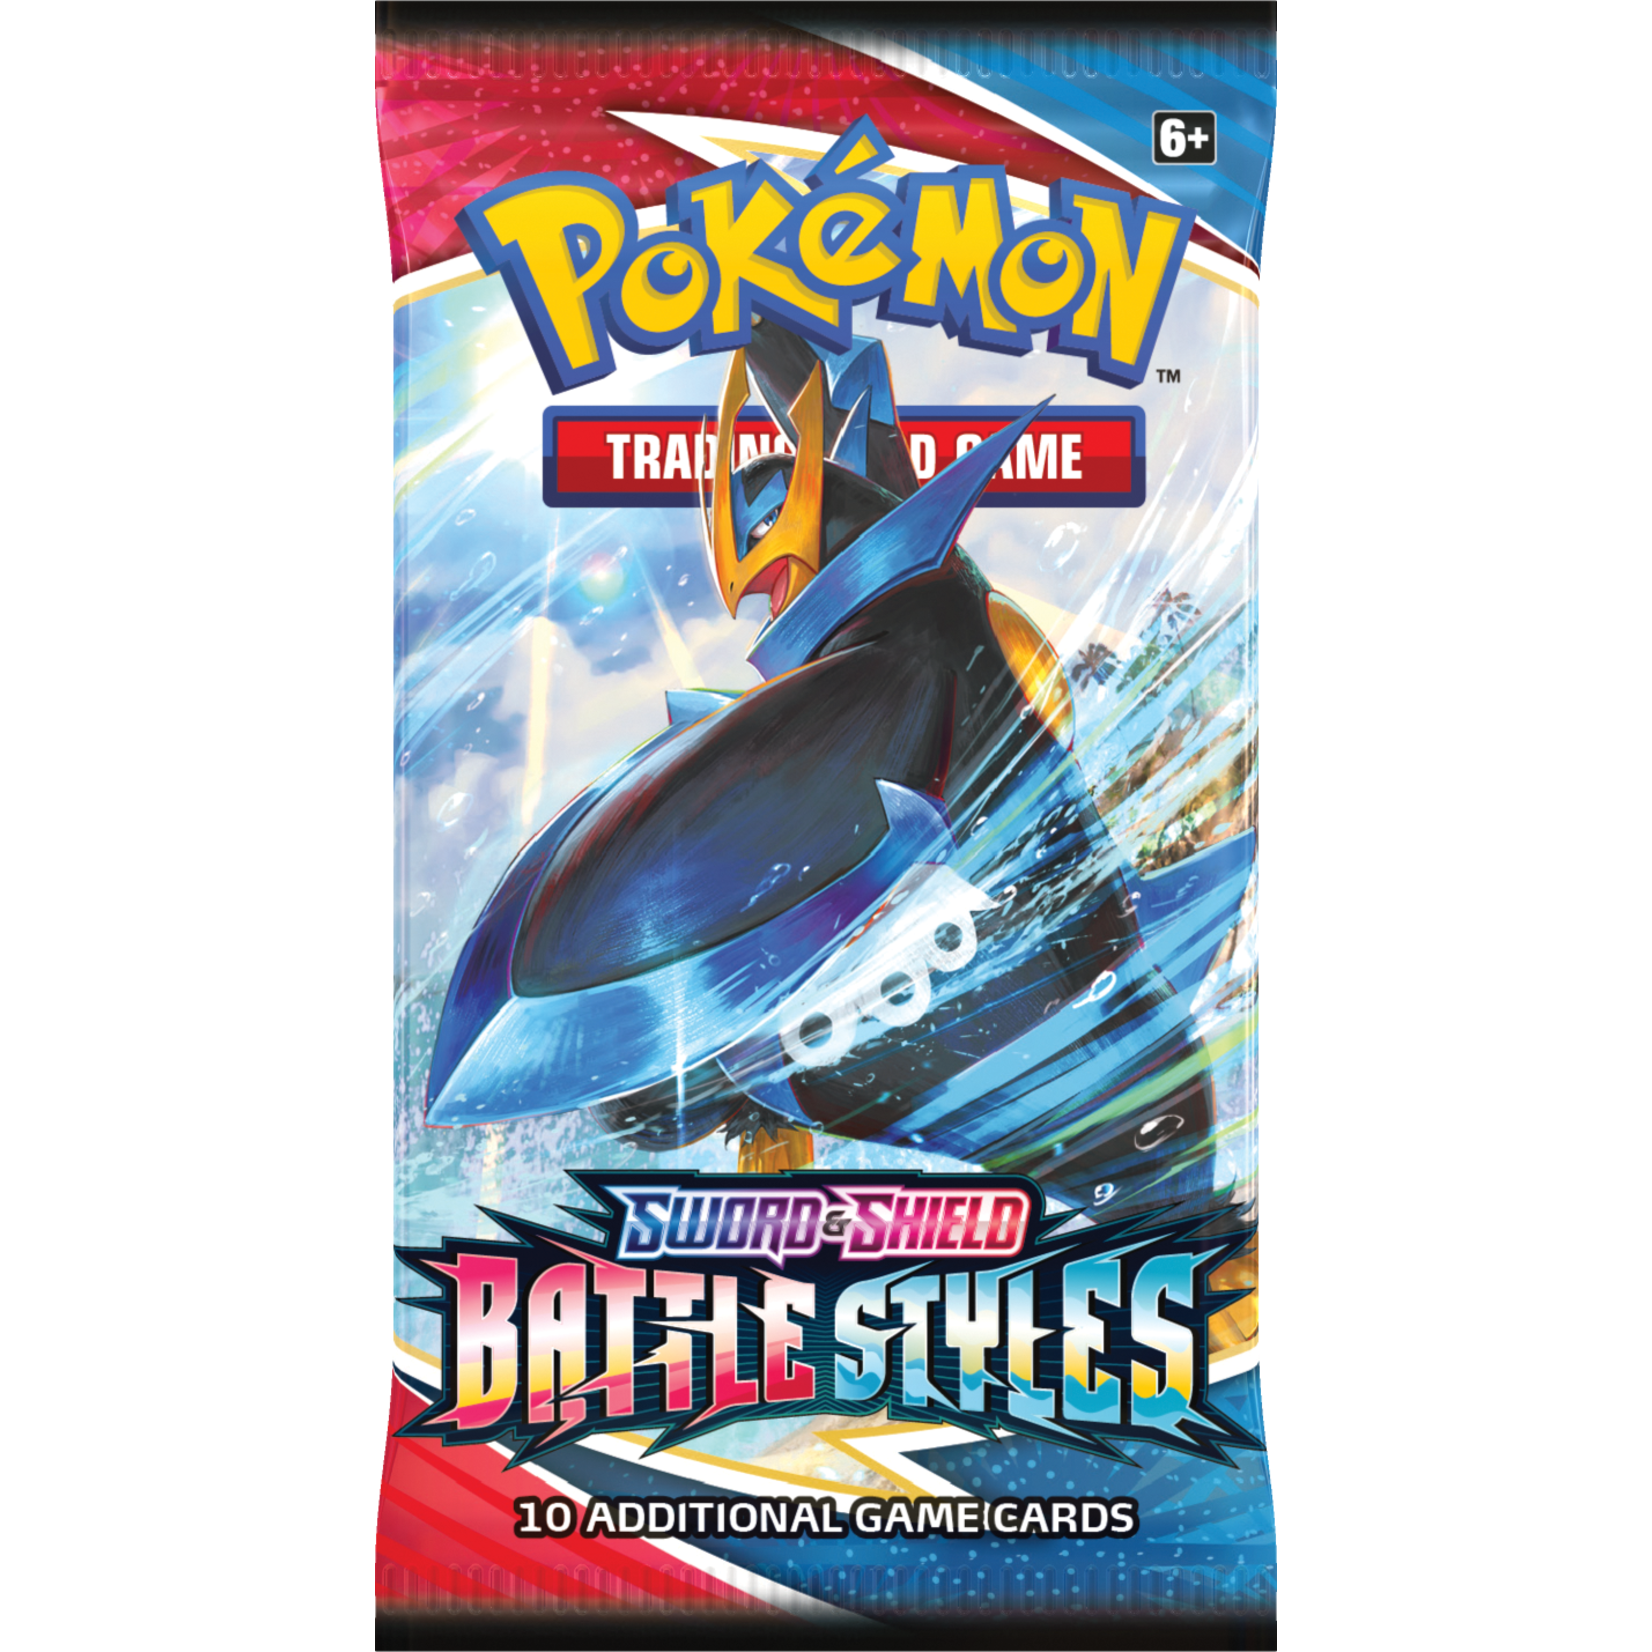 Pokémon Pokémon TCG: Sword & Shield—Battle Styles Booster Pack